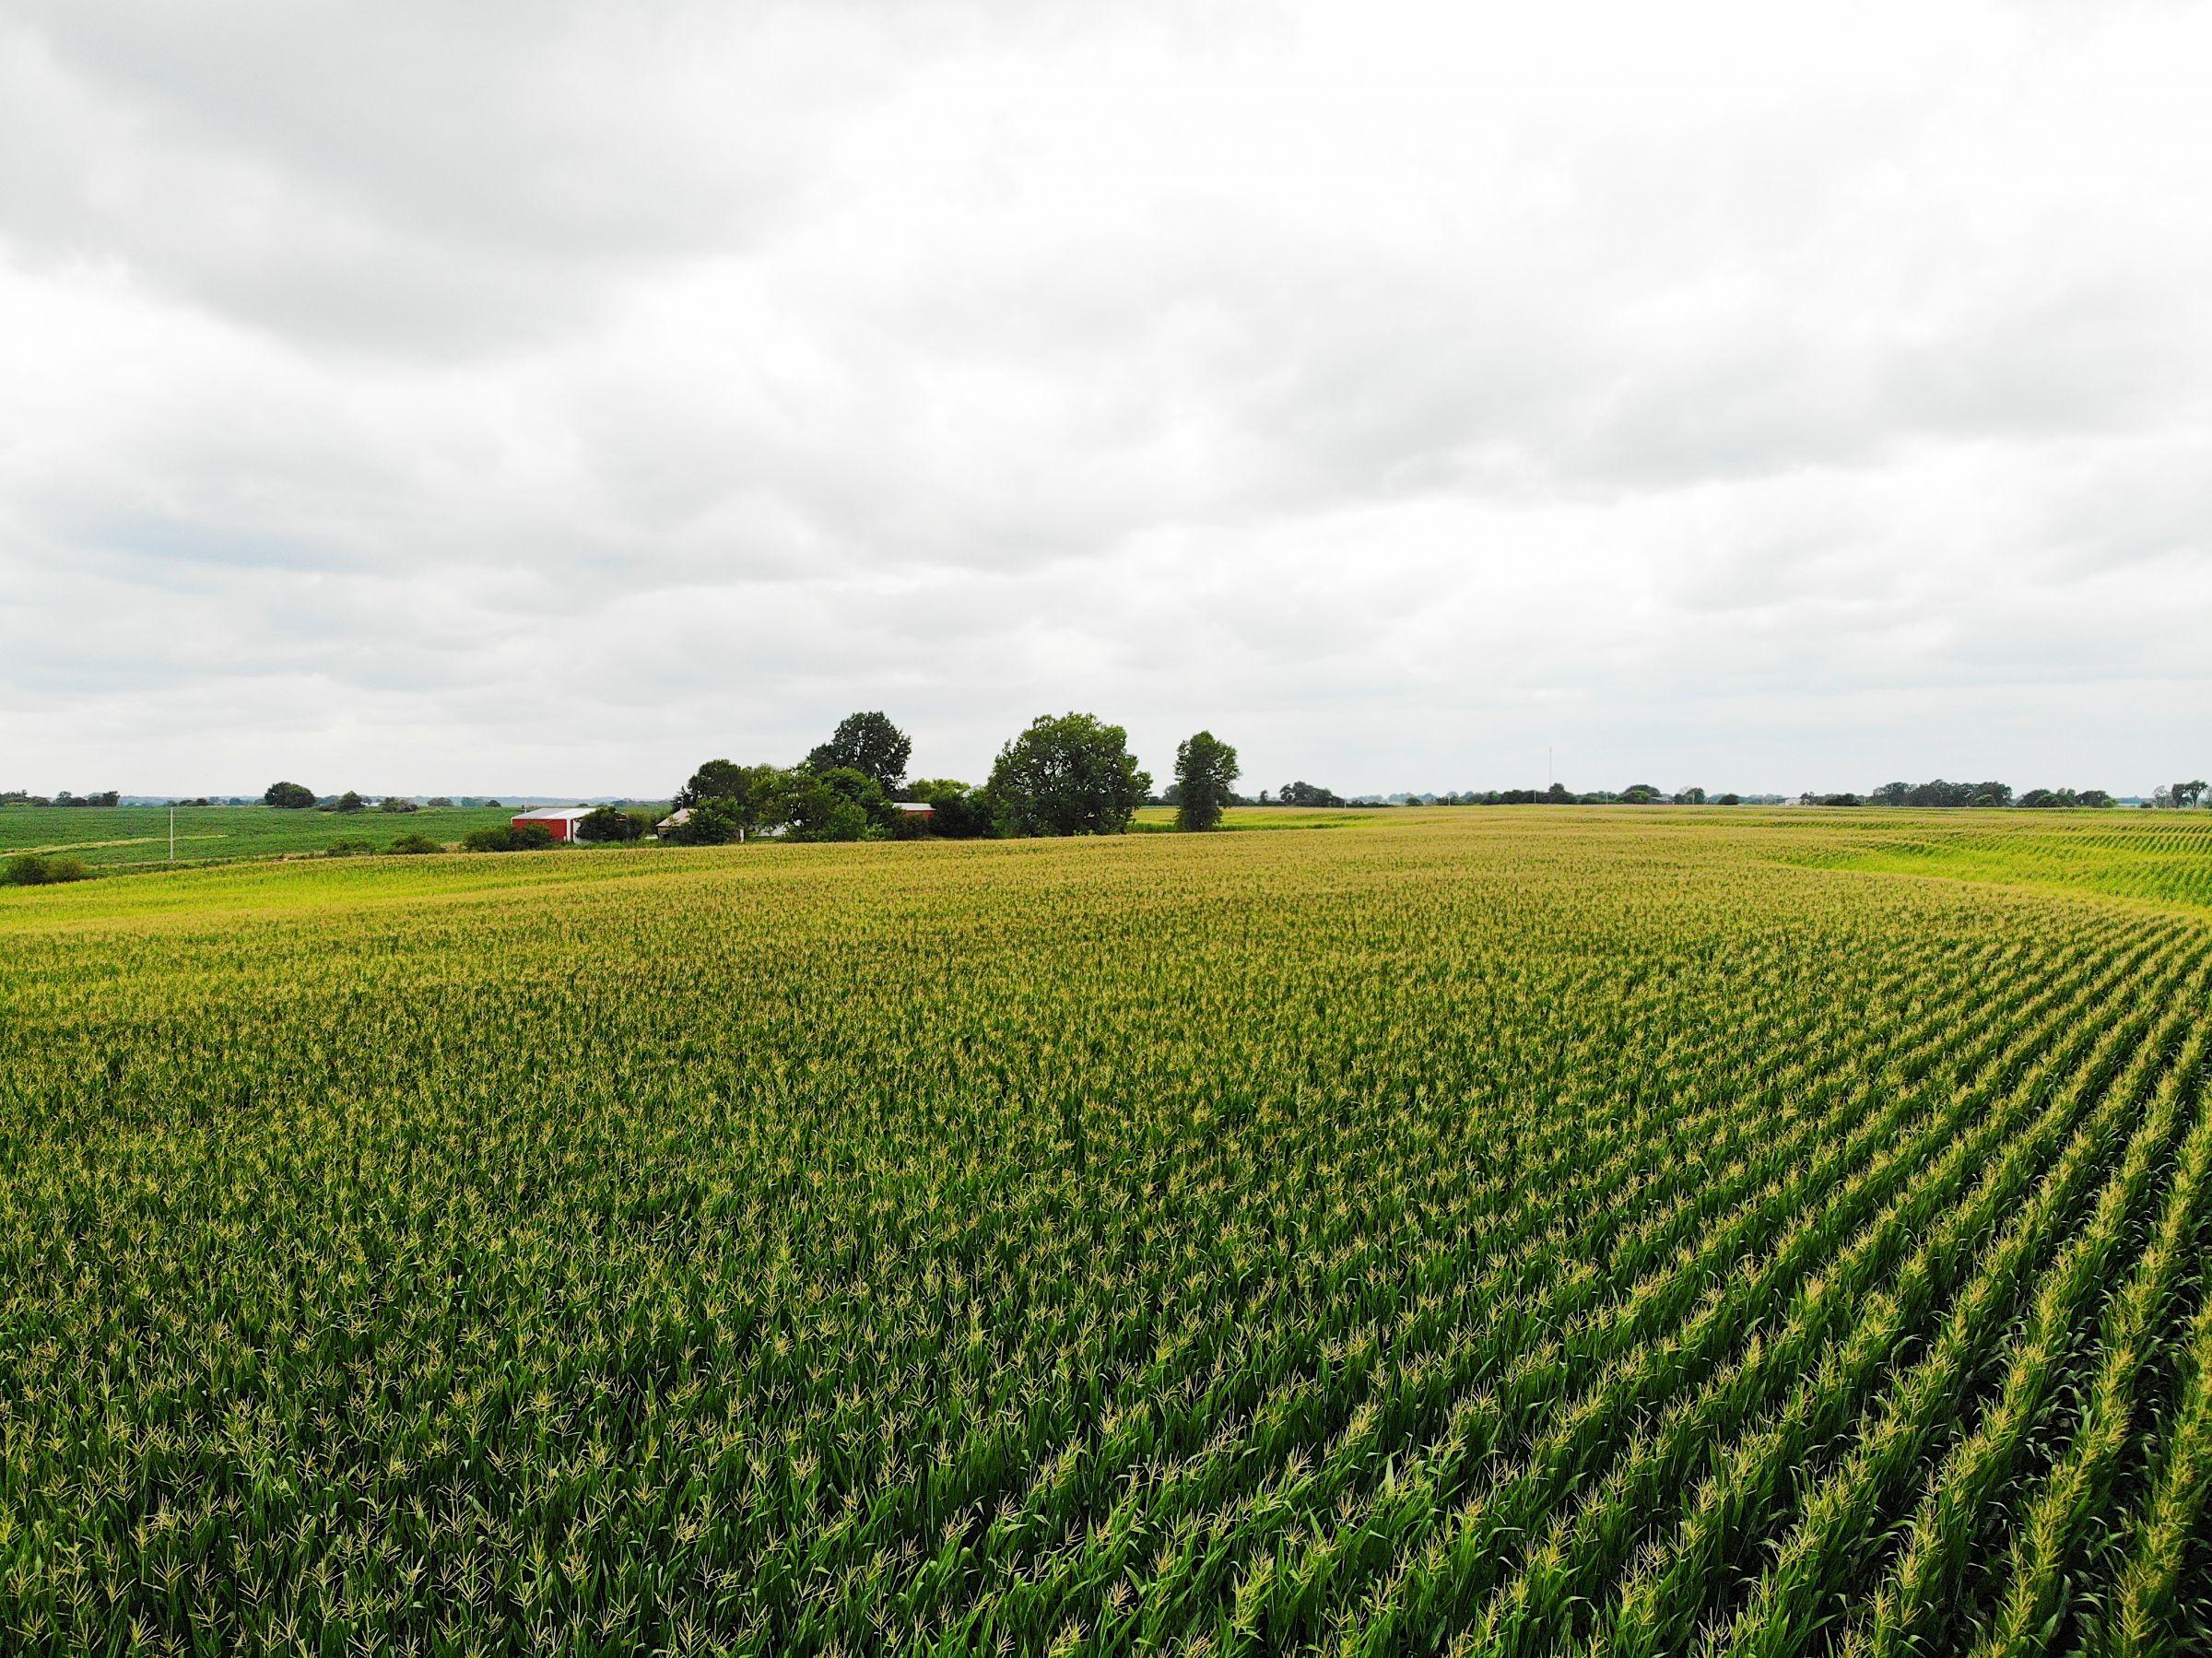 land-clarke-county-iowa-72-acres-listing-number-15106-4-2020-08-09-034305.jpg